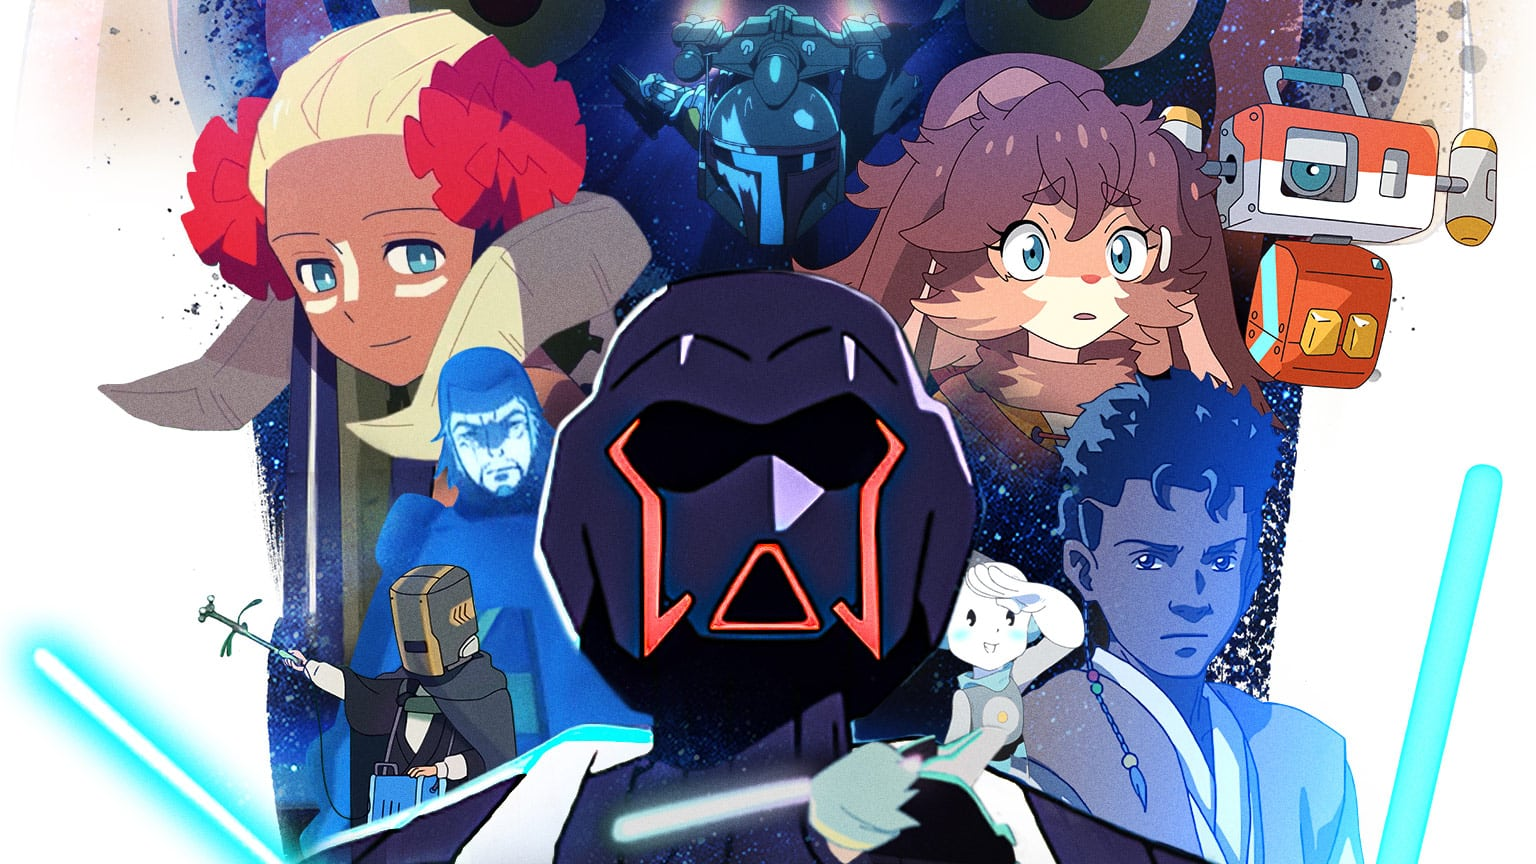 star-wars-visions-poster_TALL-296276227972